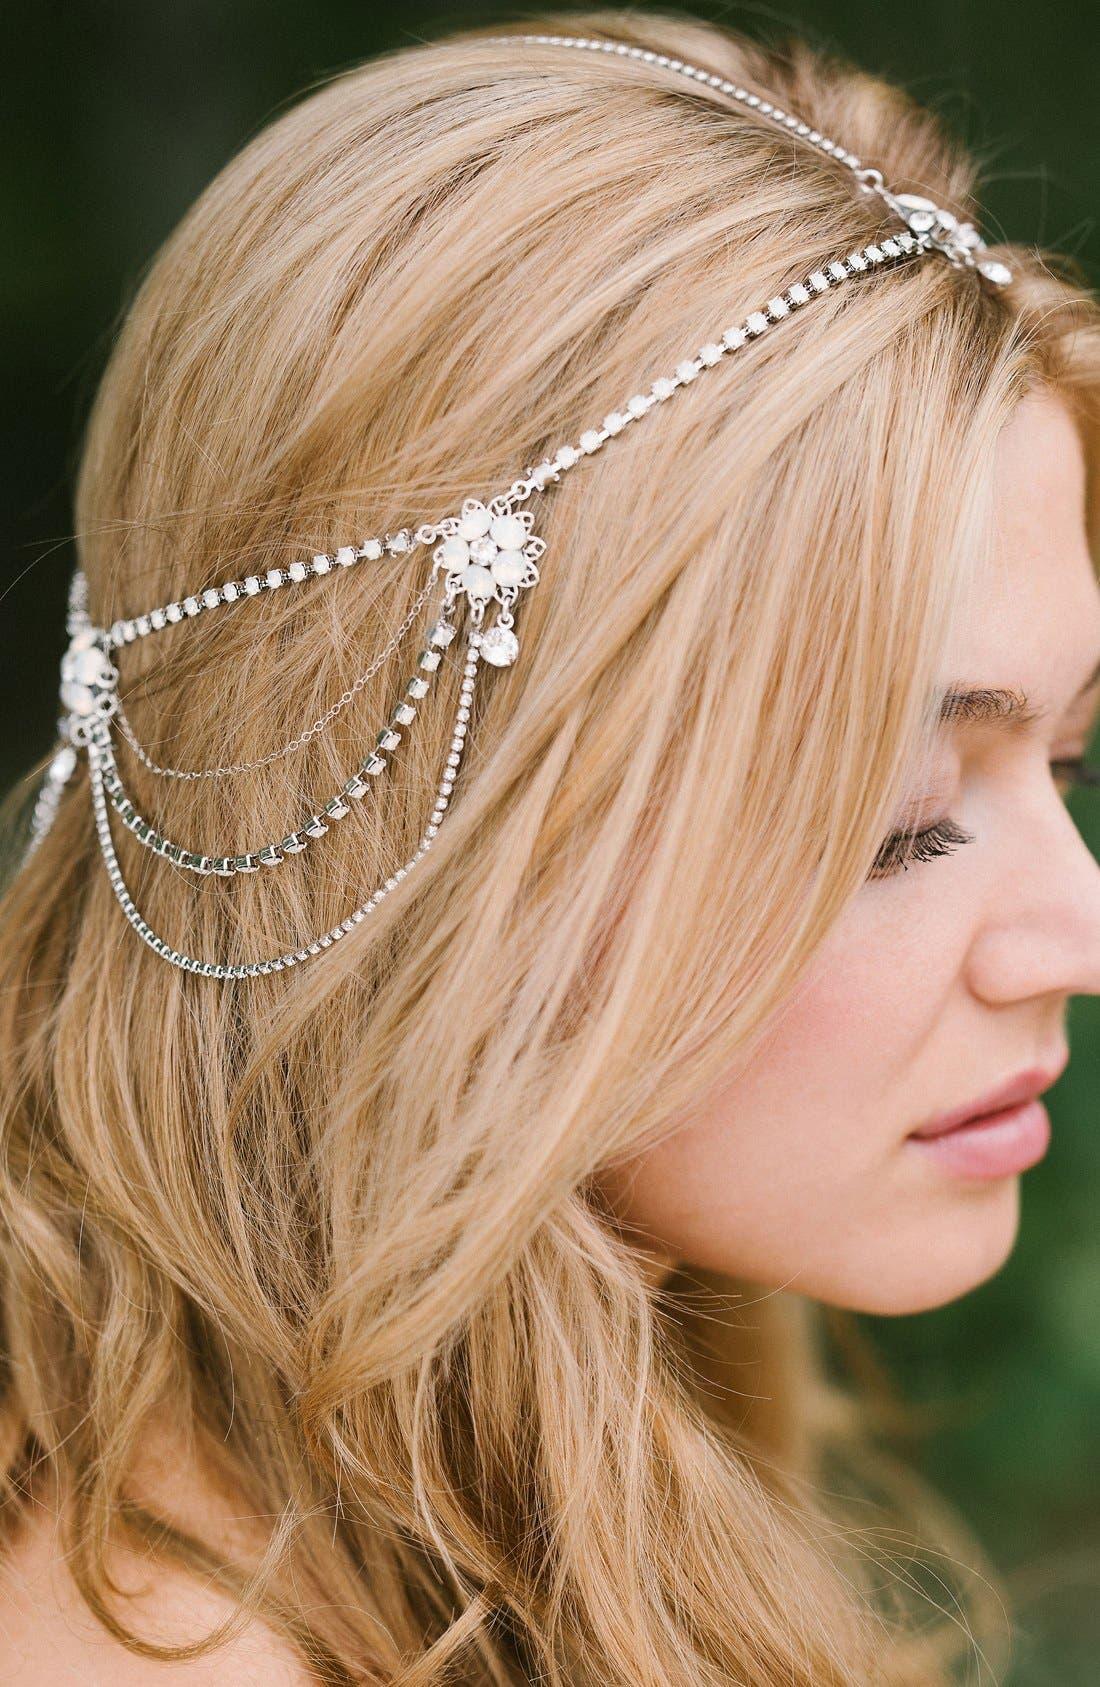 Main Image - Sara Gabriel 'Madeline' Floral Crystal Hair Chain